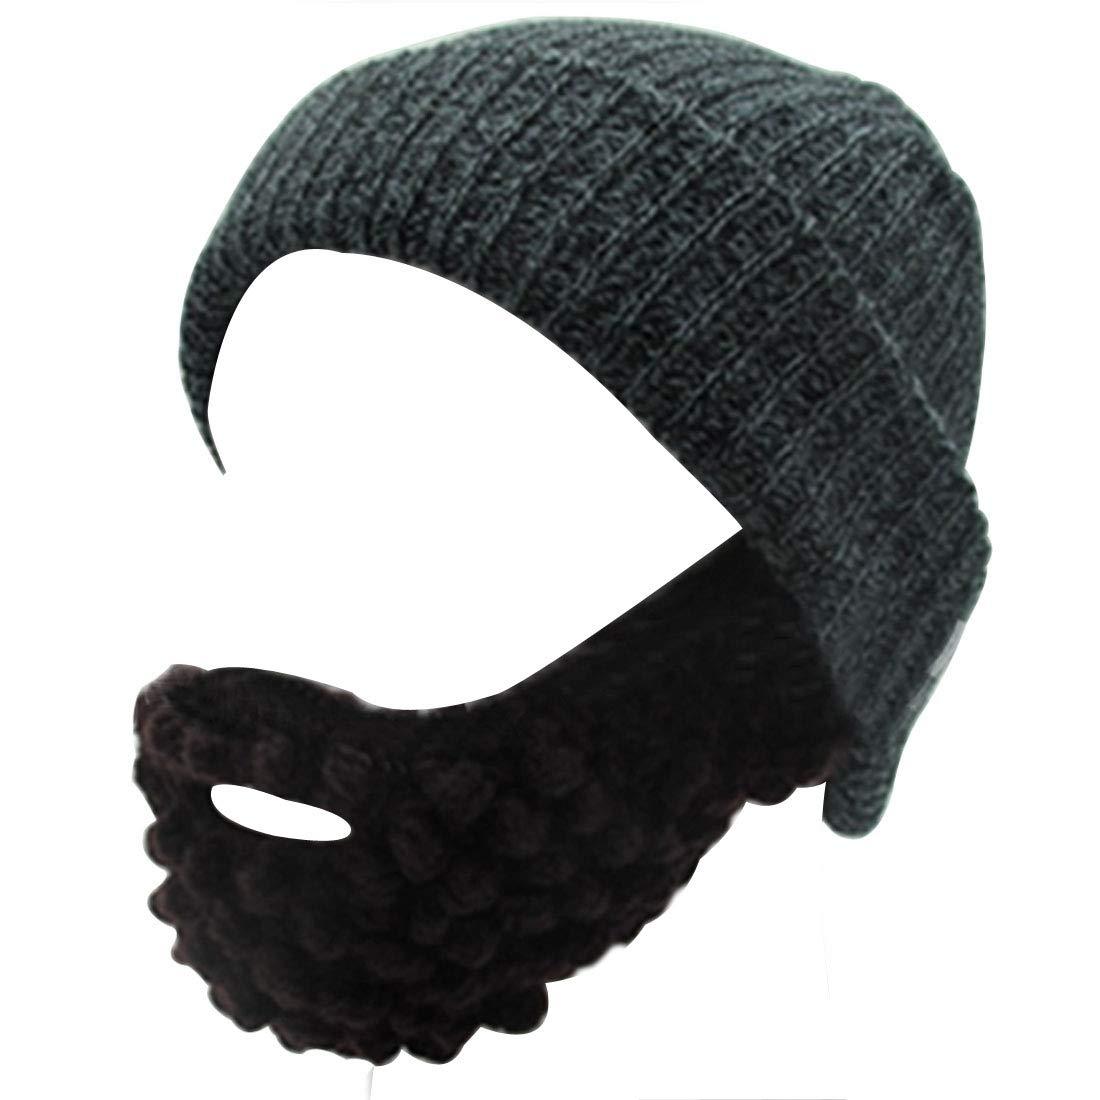 e38ecf13fd8 Lerben Men Women Beard Hats Warm Winter Knitted Beanie Caps Ski Hat ...